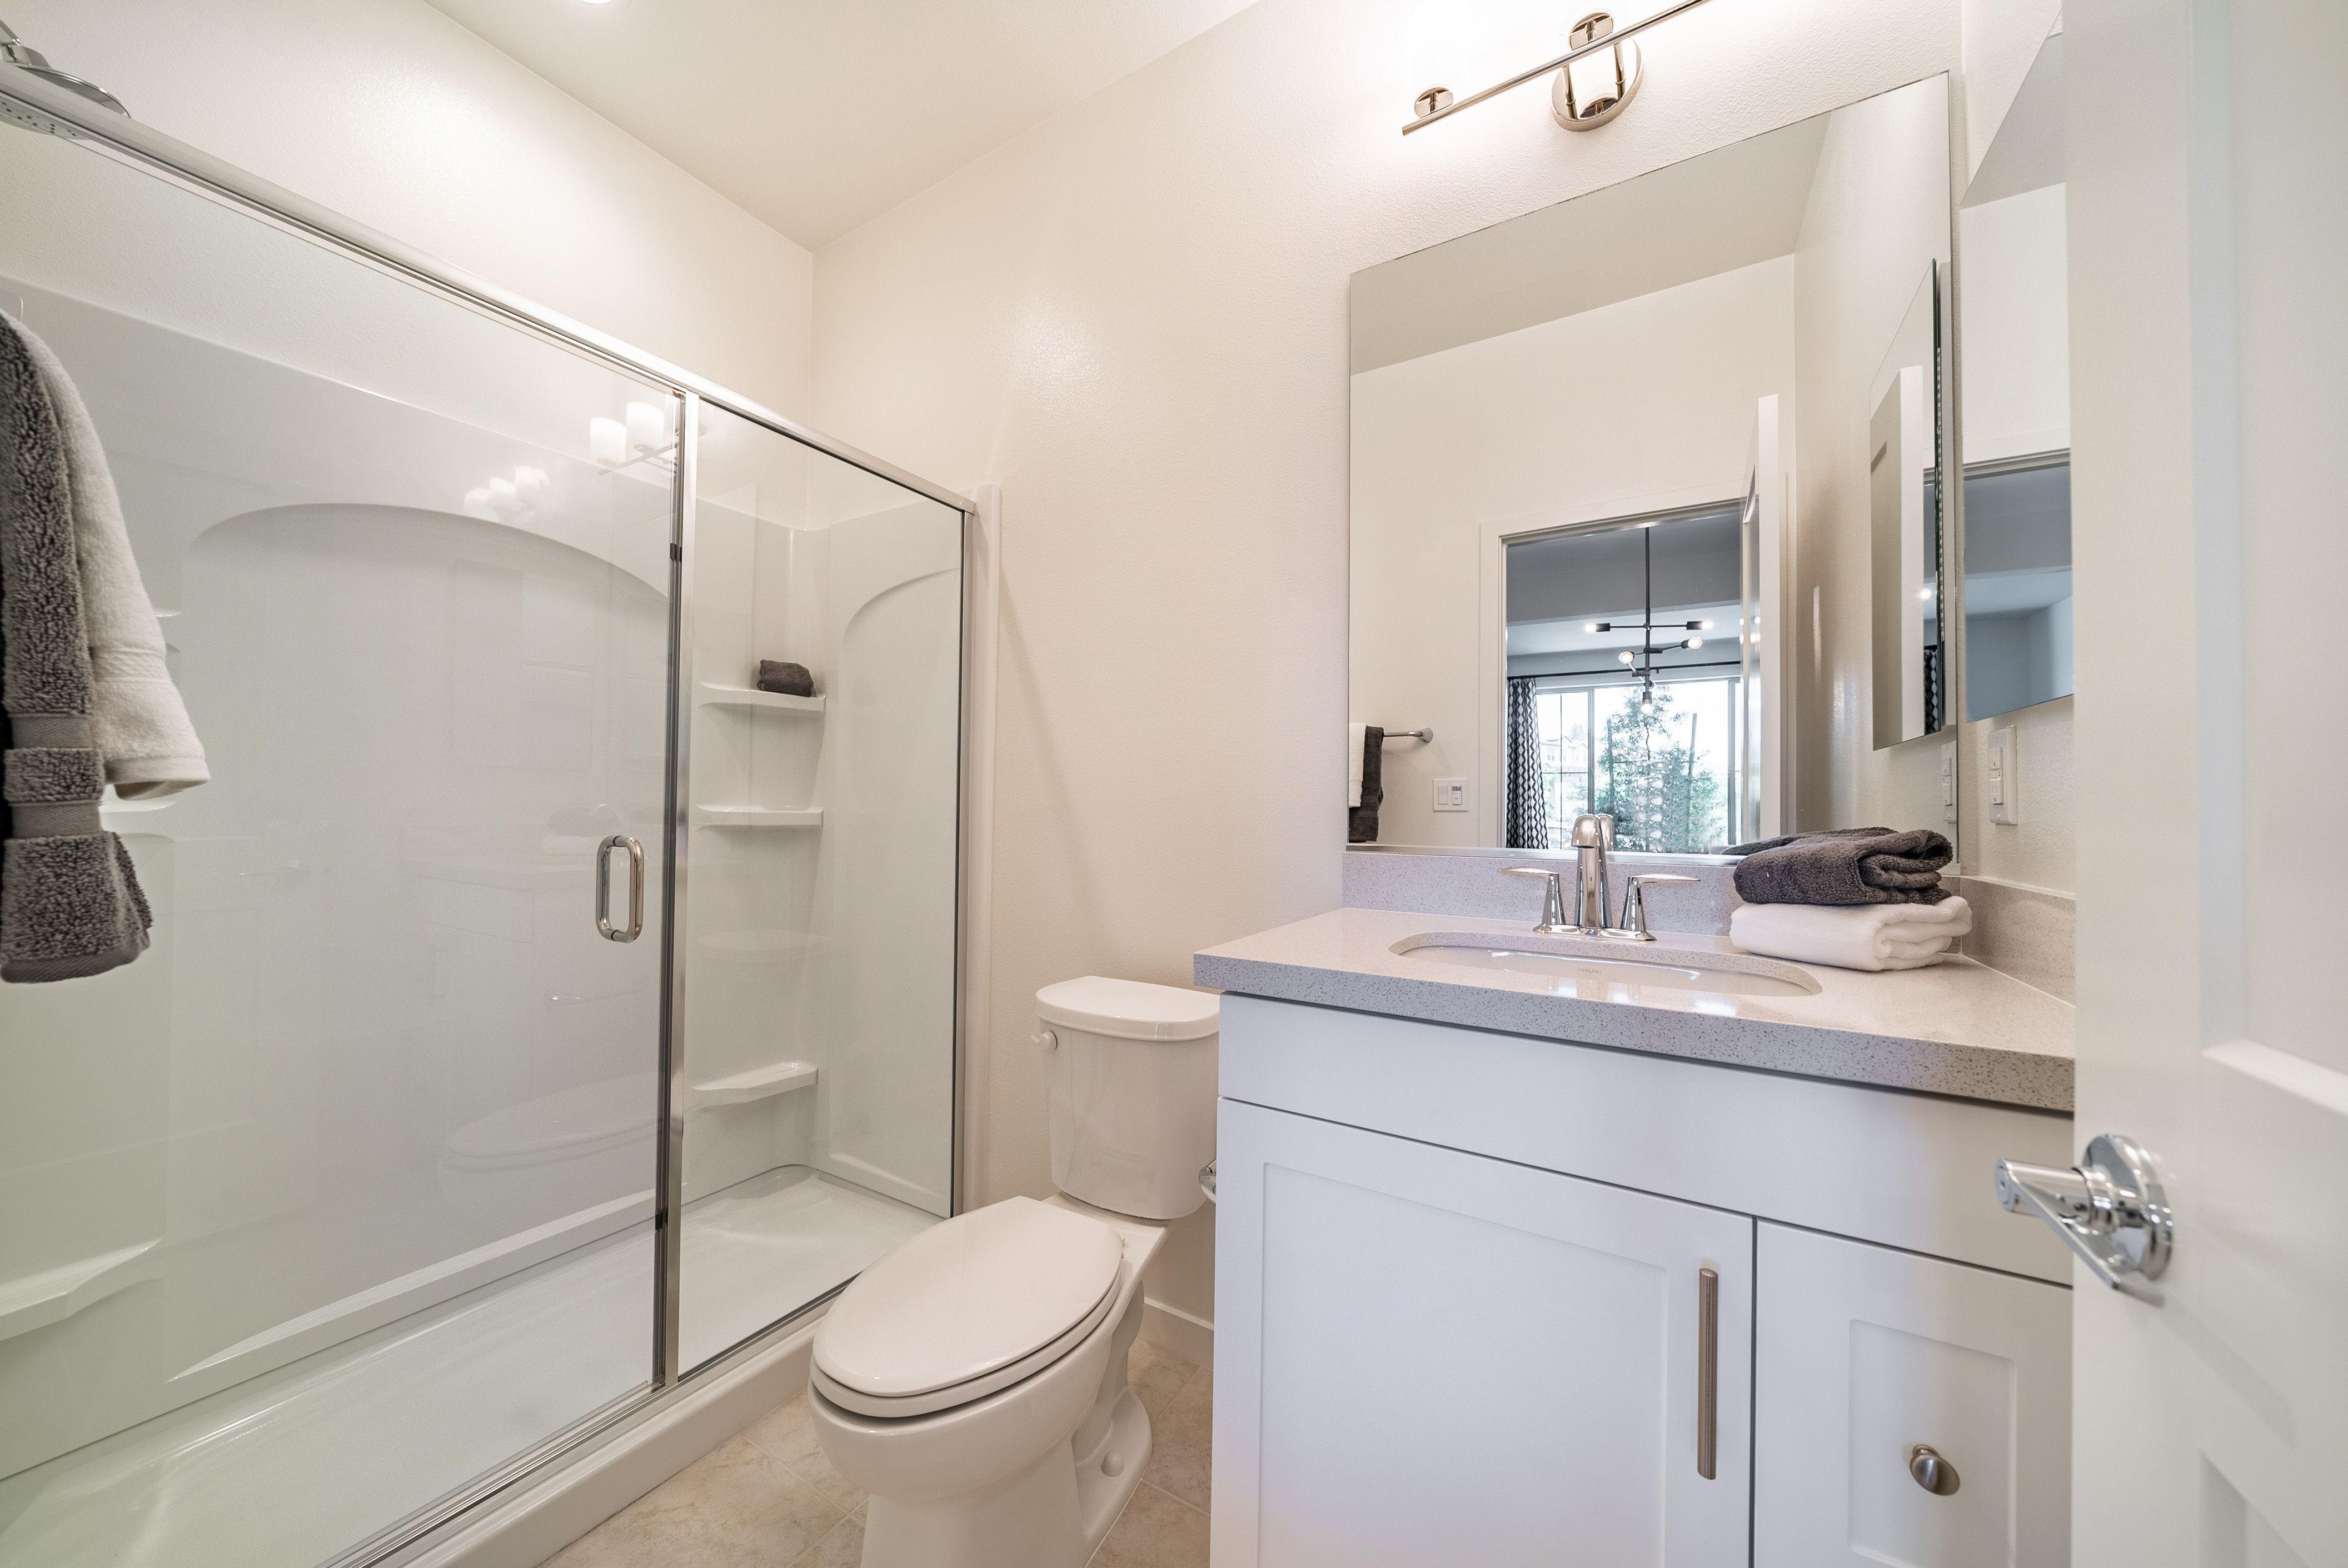 Bathroom featured in the Plan 6 Y By Landsea Homes in Orange County, CA